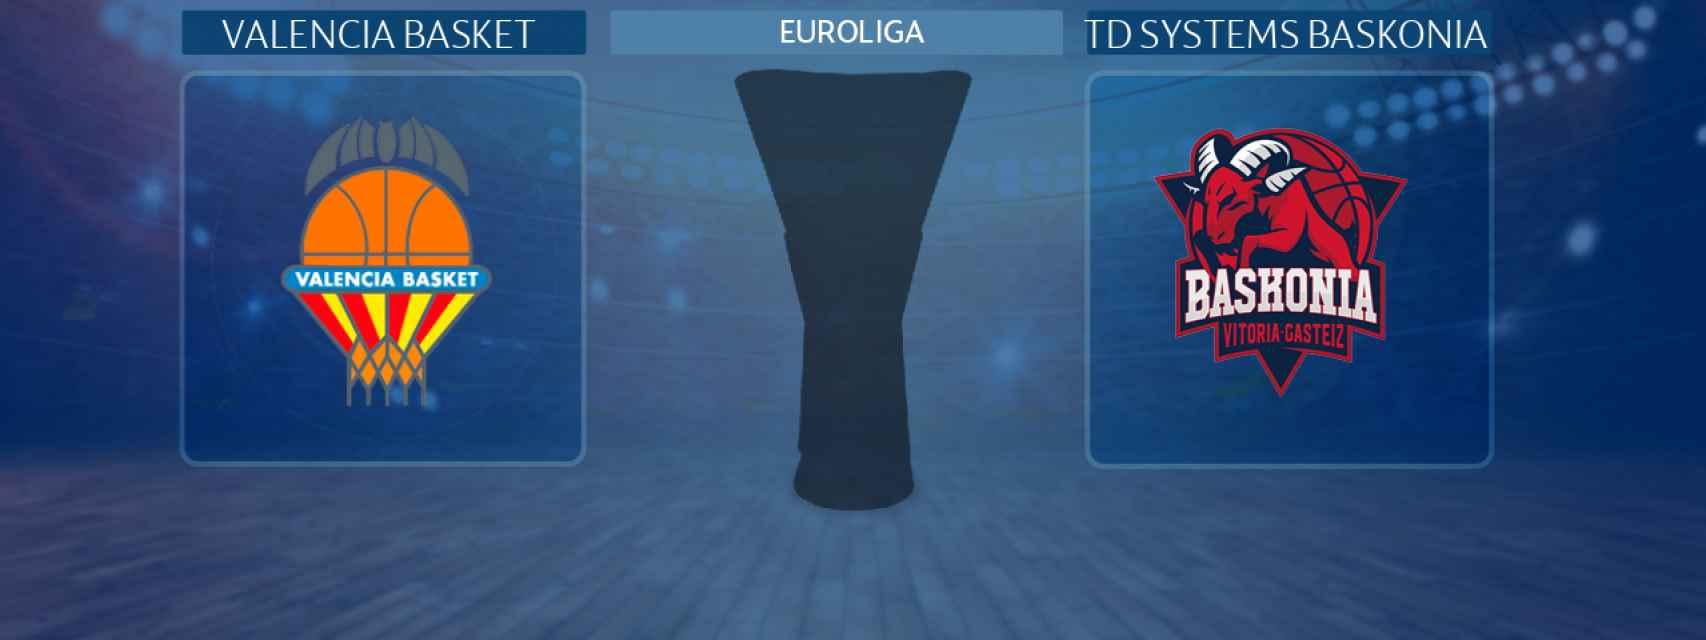 Valencia Basket - TD Systems Baskonia, partido de la Euroliga